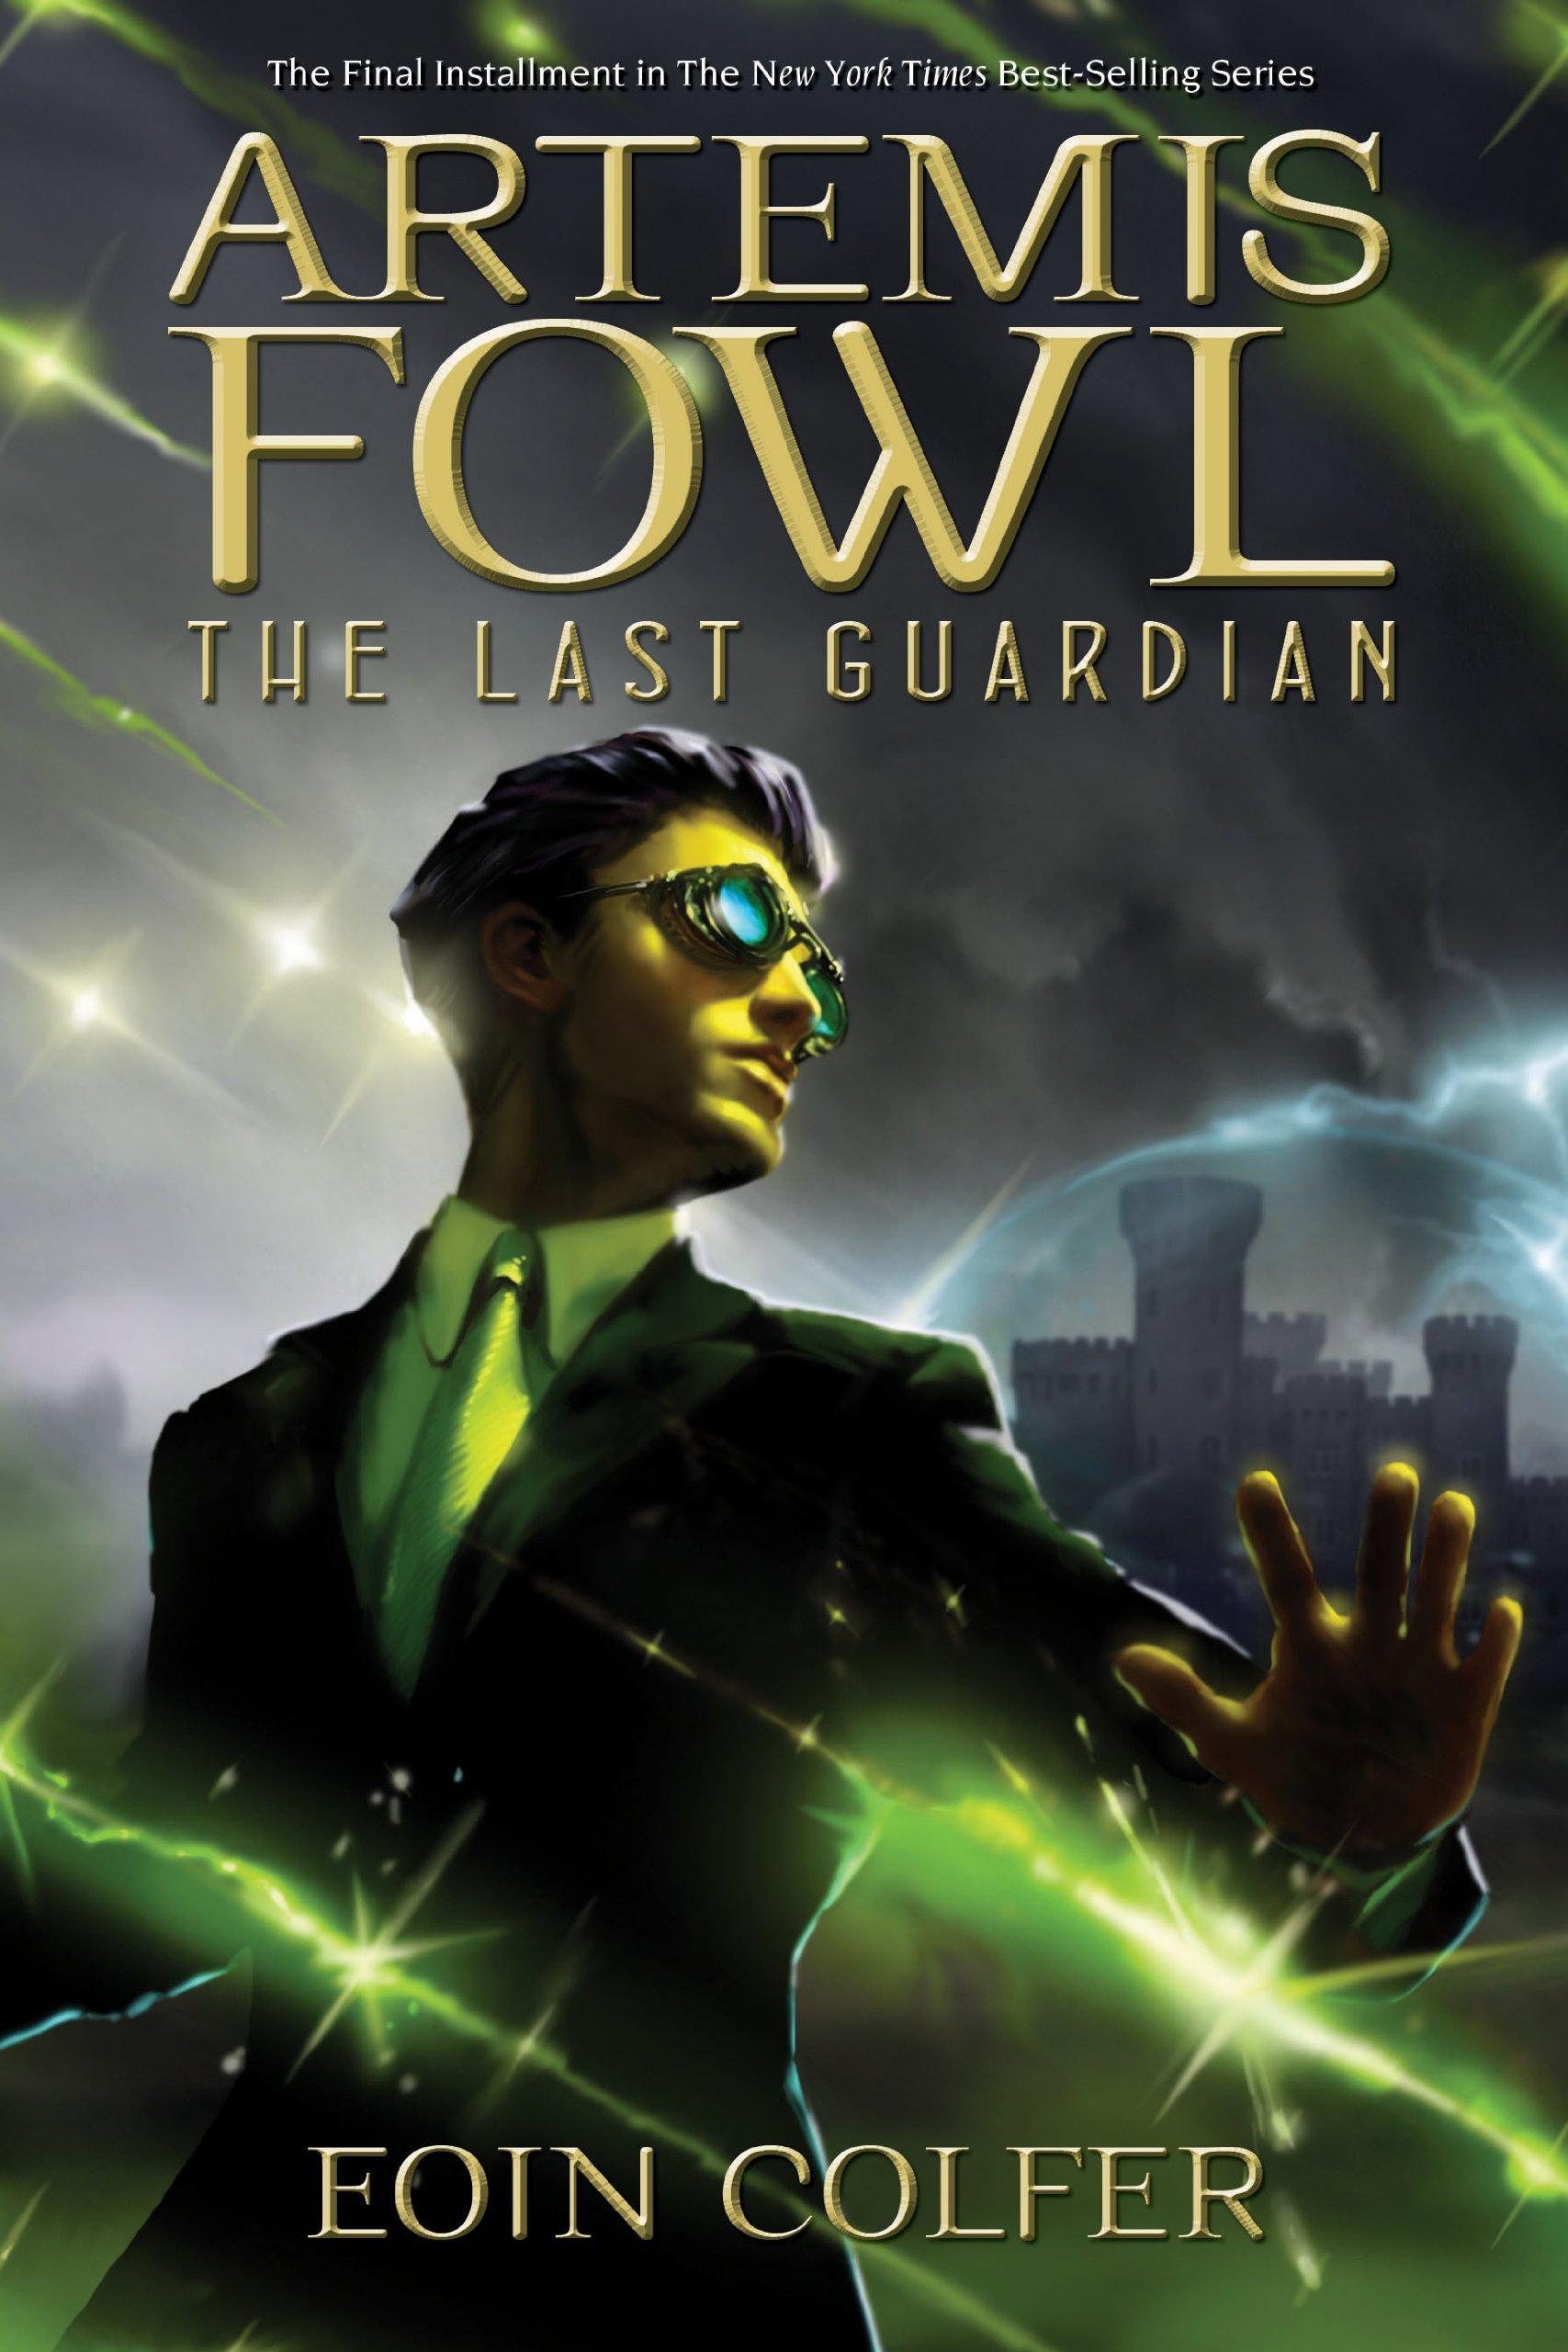 File:Last guardian cover.jpg